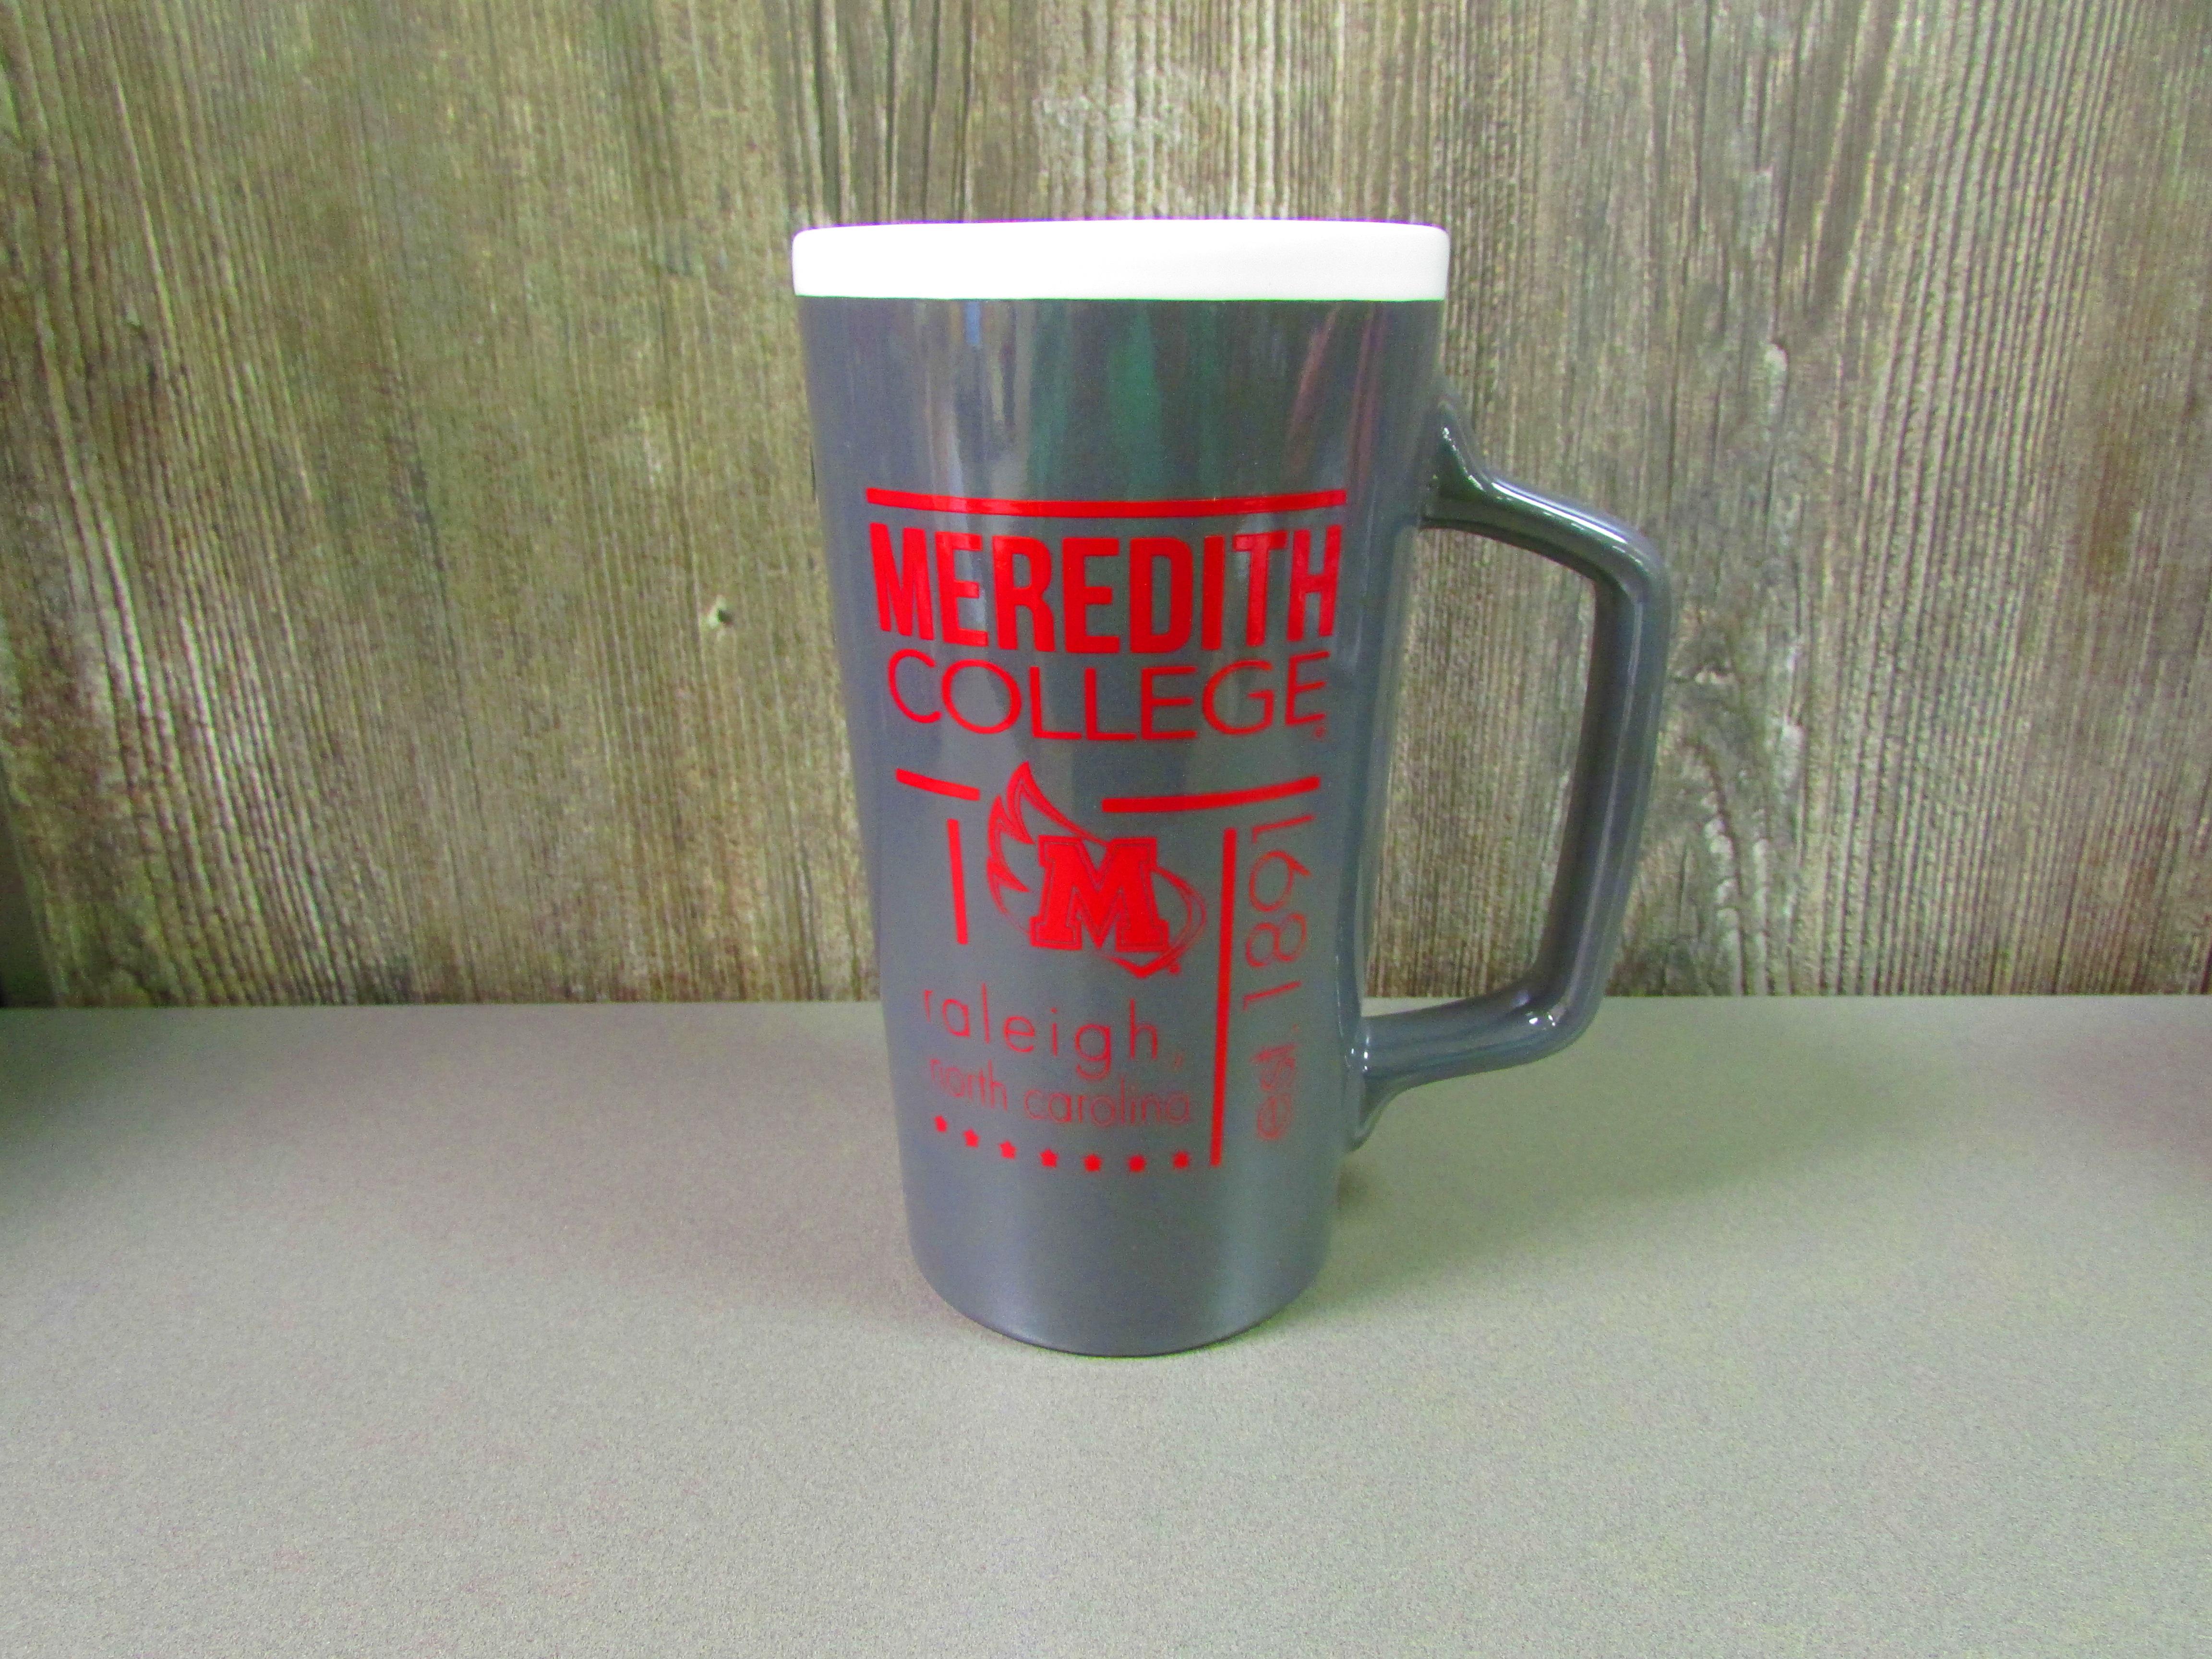 Image for the Cafe Mug product